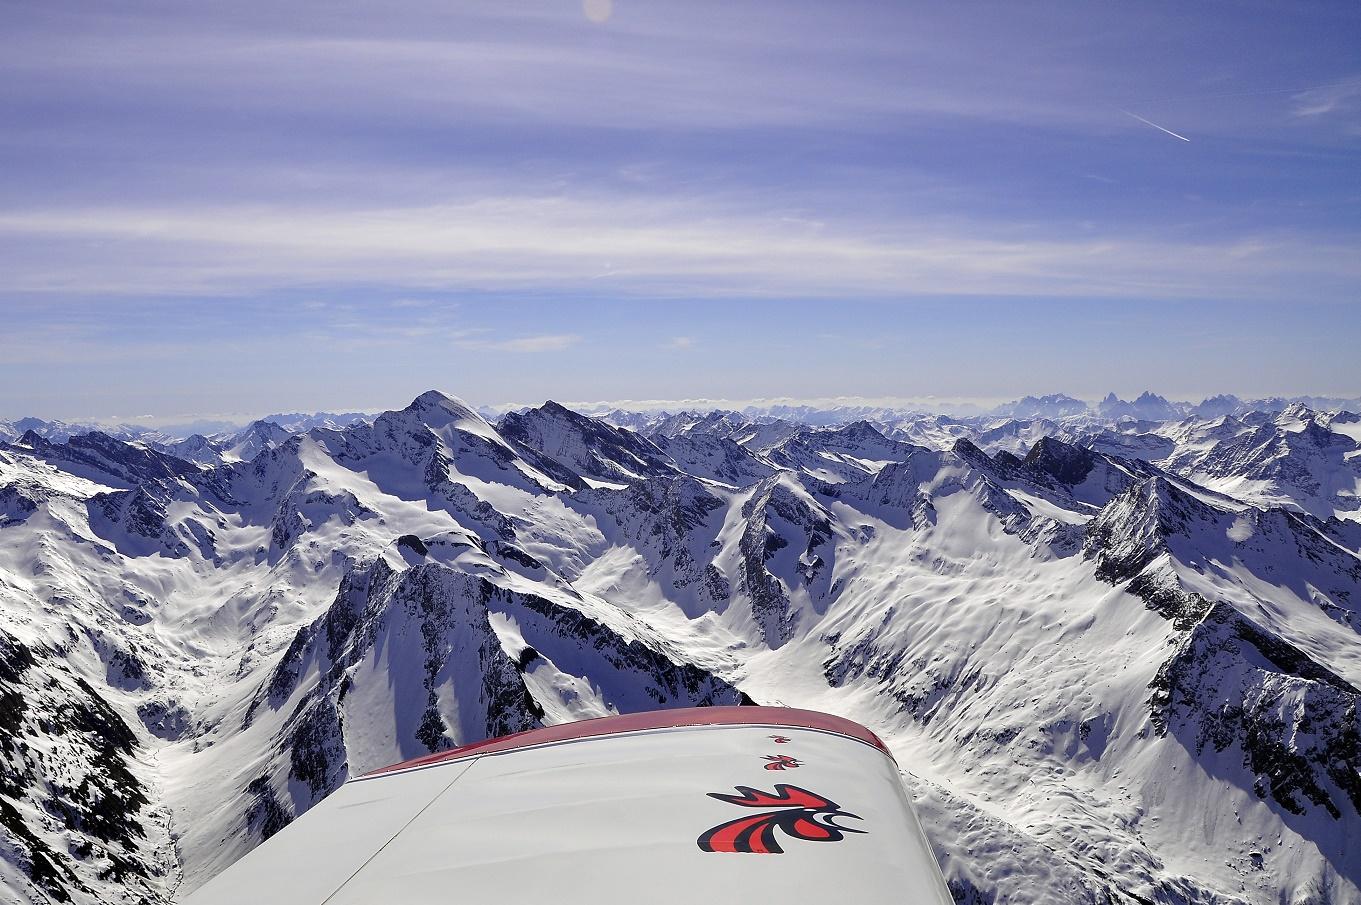 Rieserfernergruppe Dolomiten